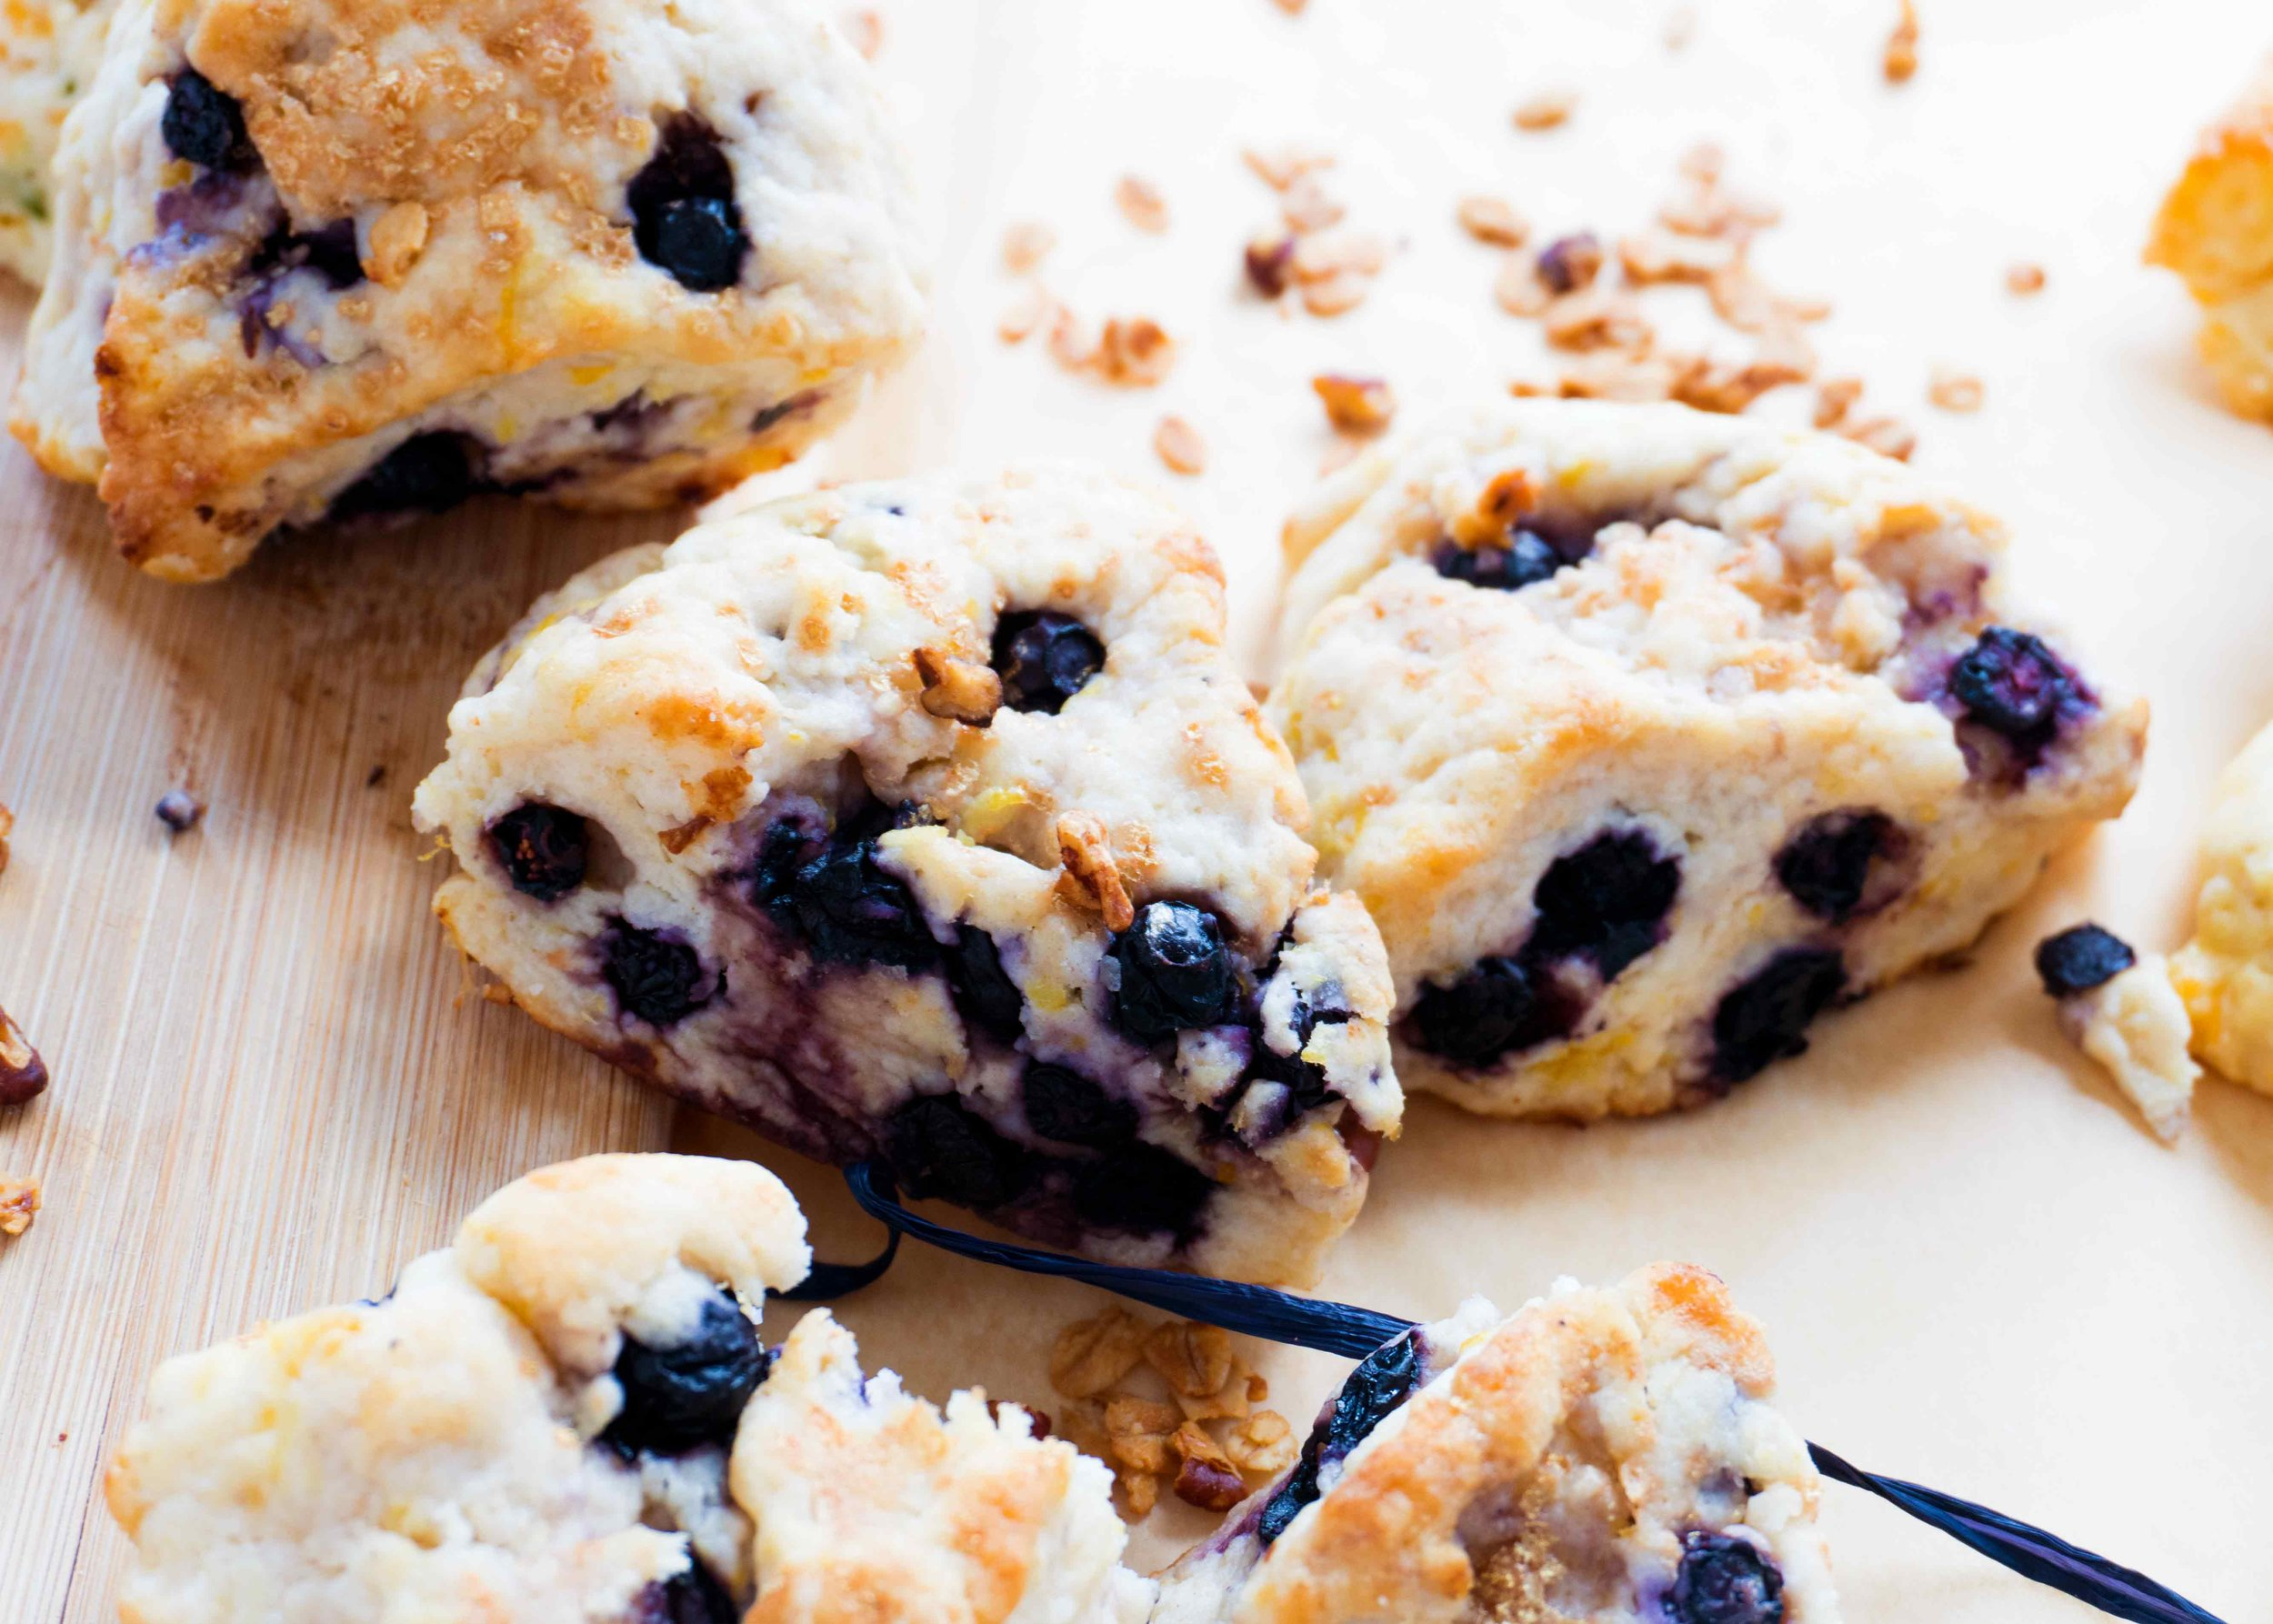 - Blueberry Scone